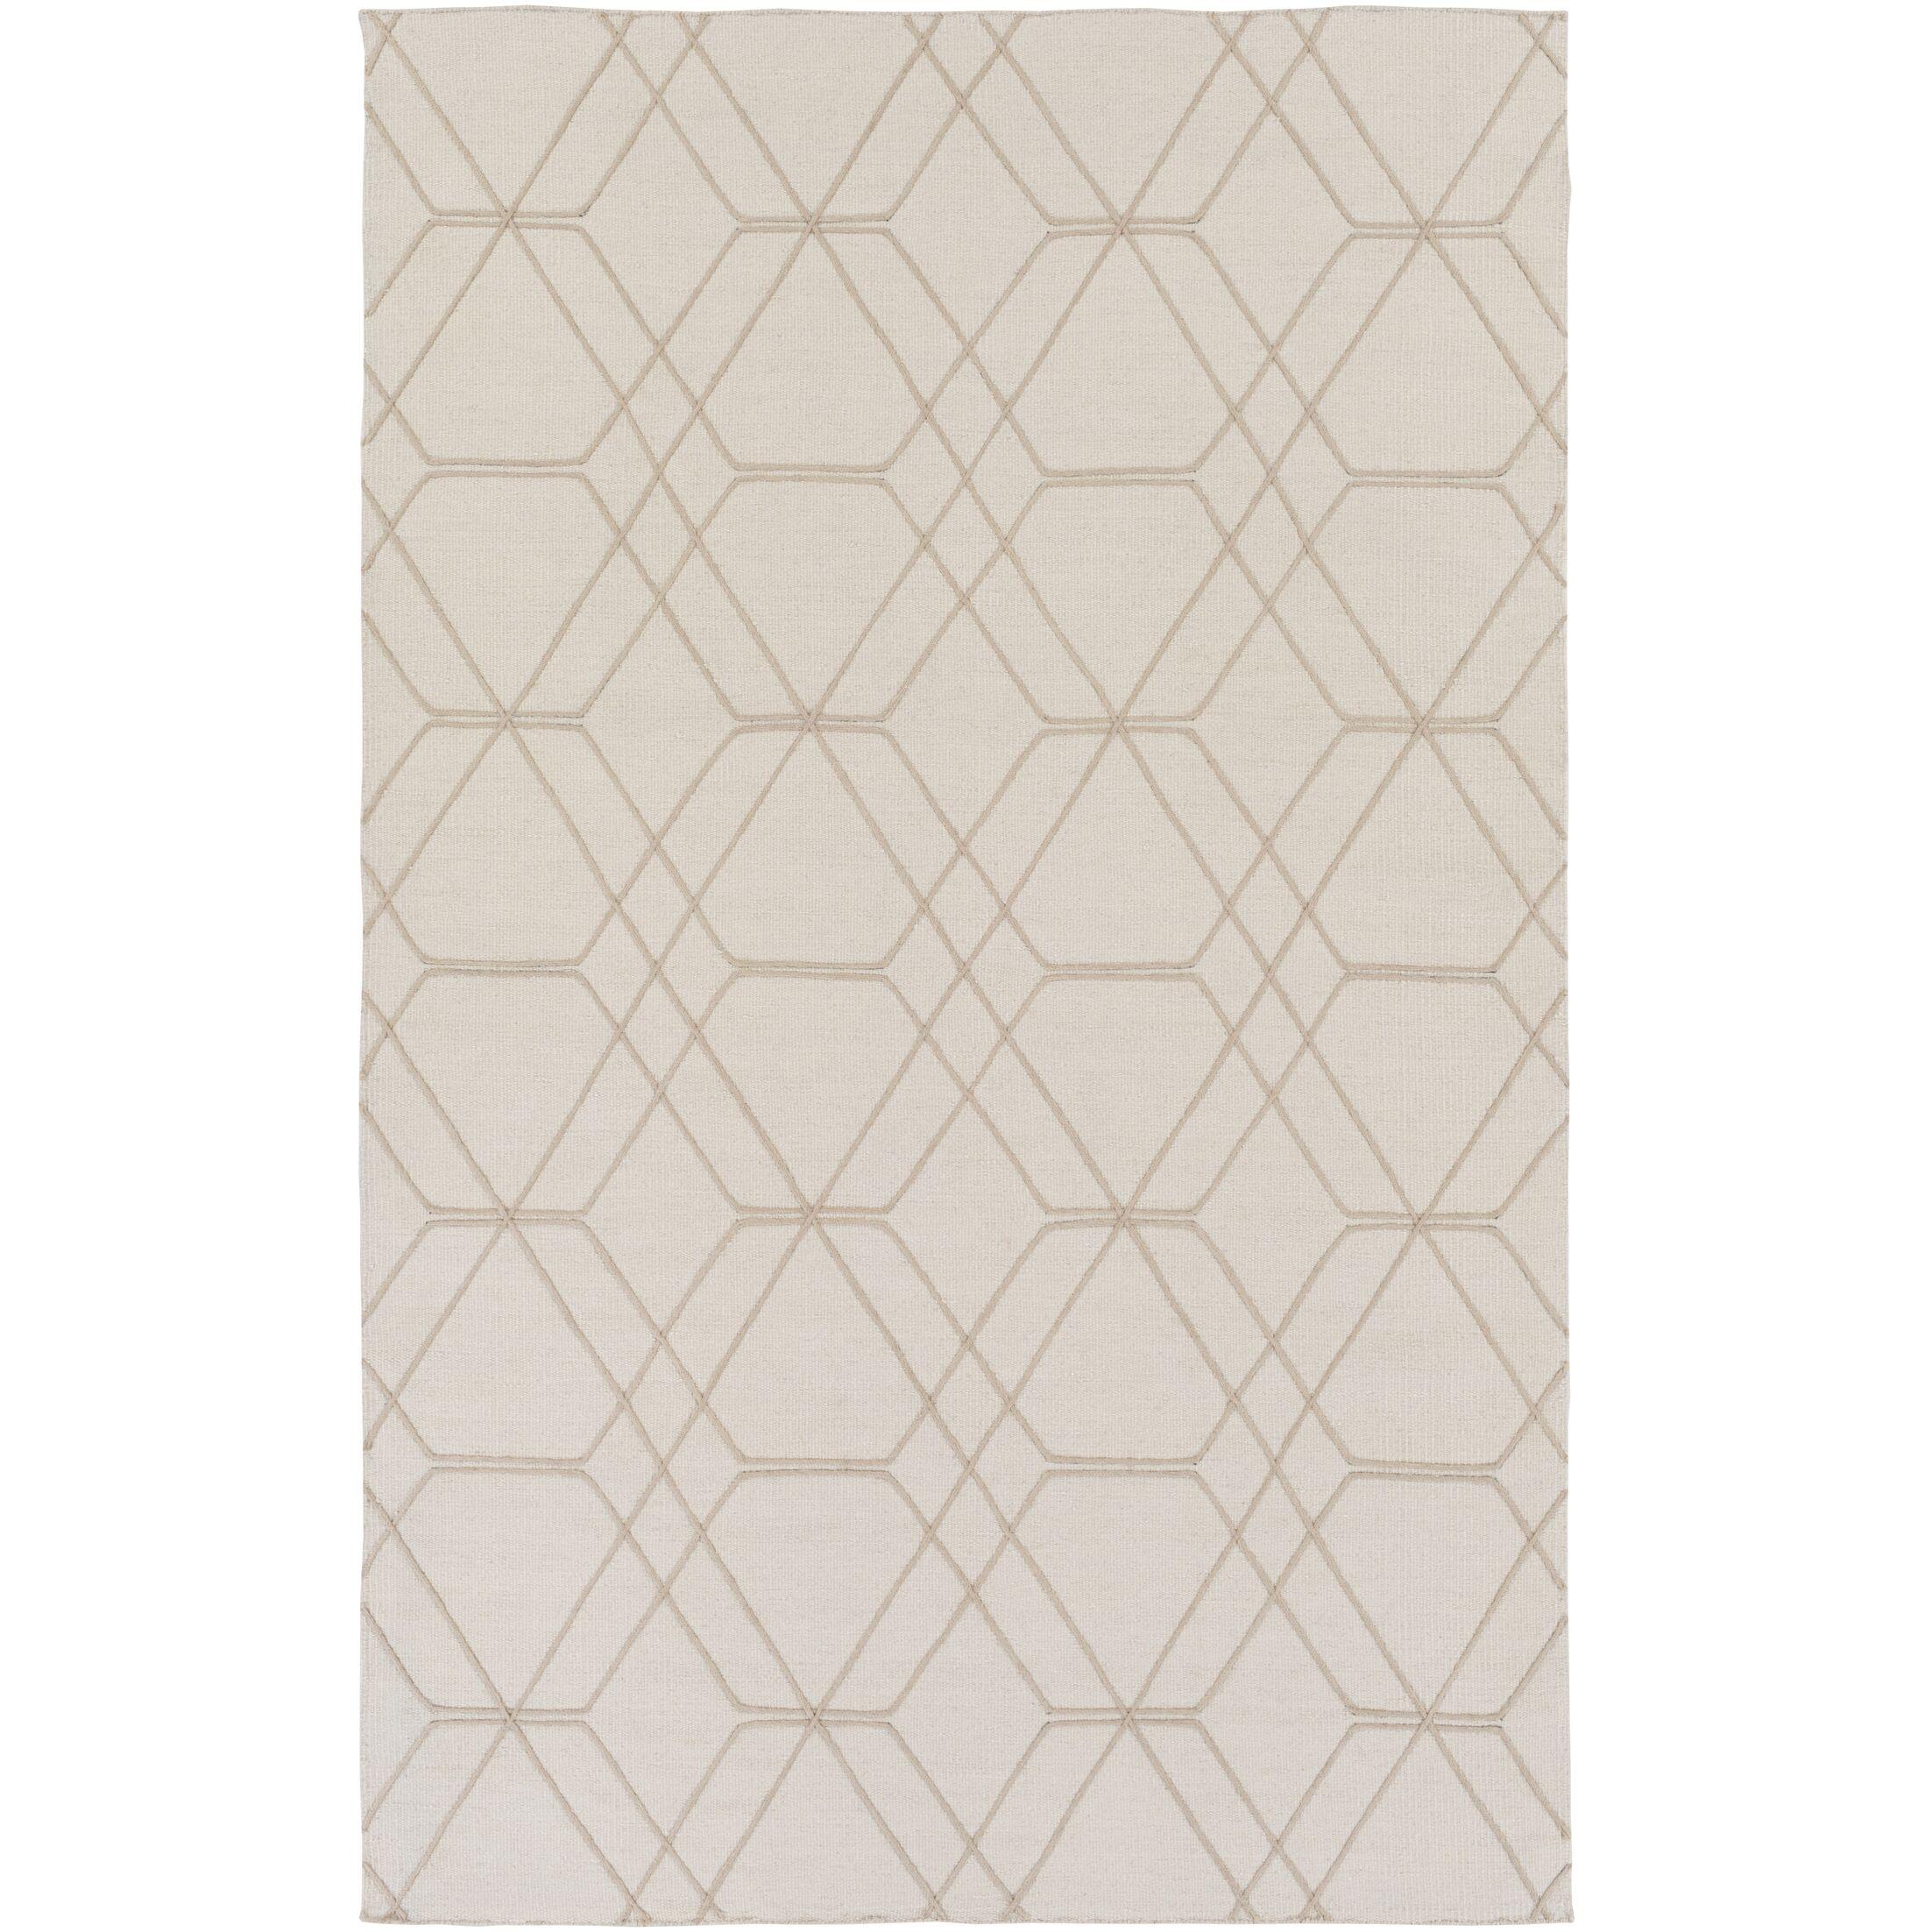 Robin Hand-Woven Cream Area Rug Rug Size: Rectangle 5' x 7'6